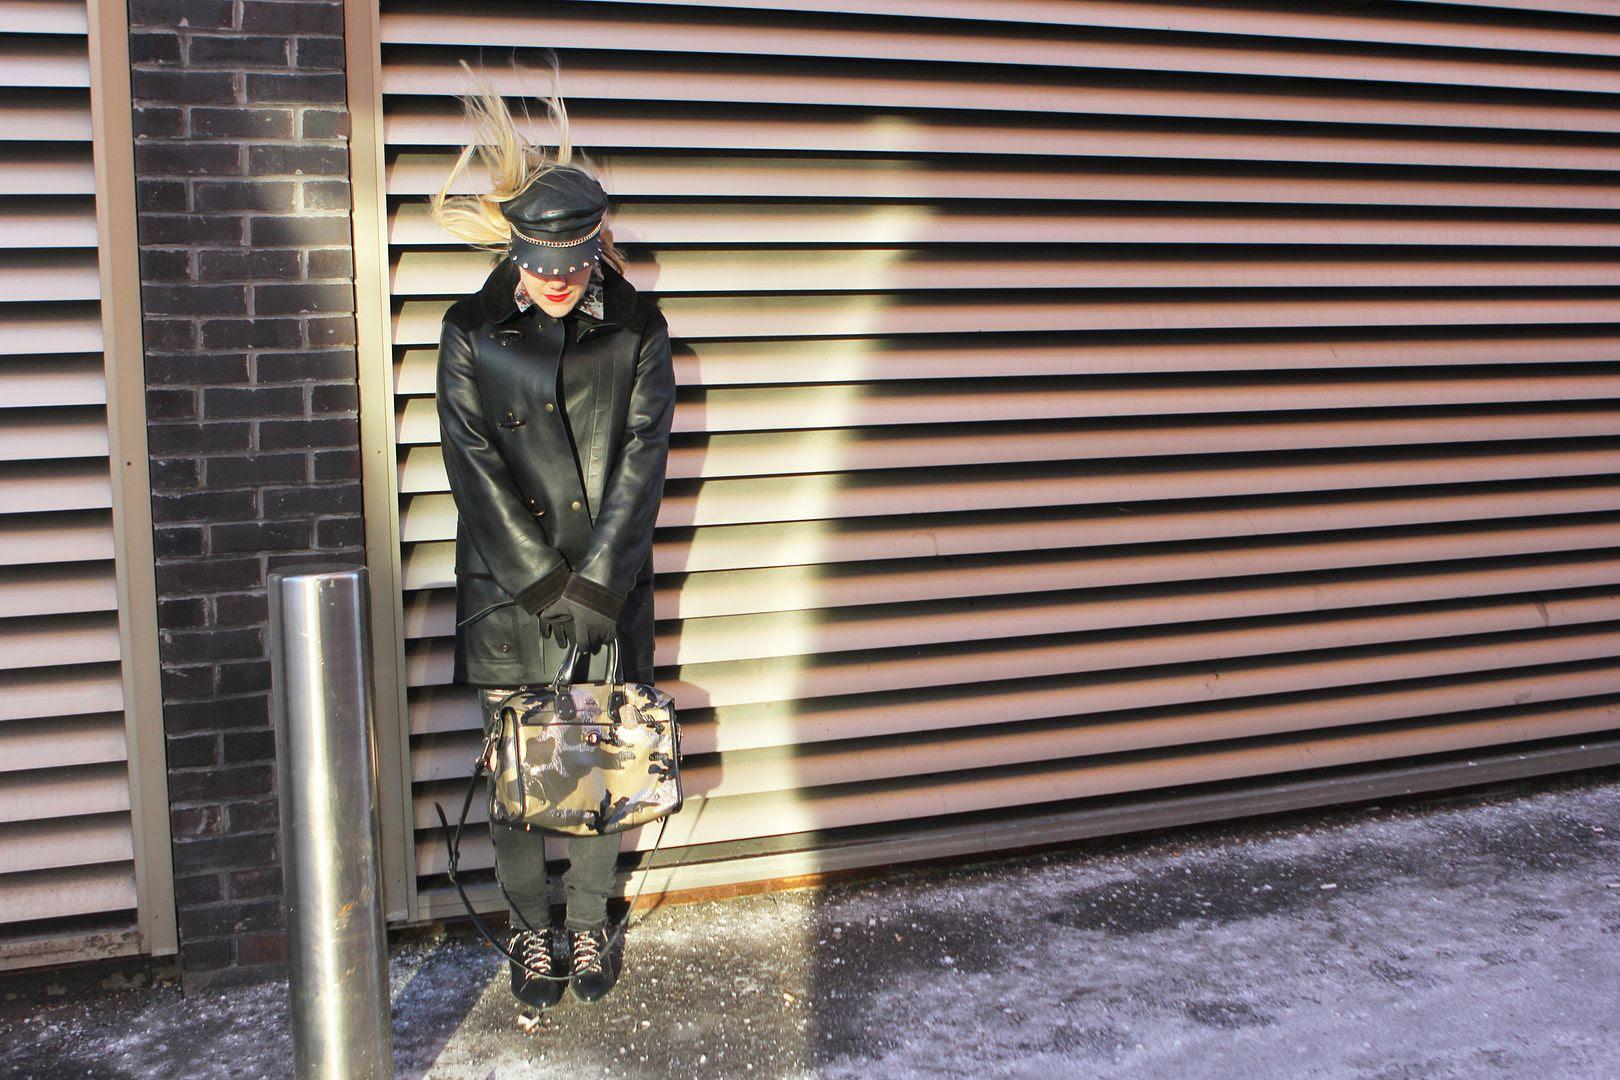 photo coach-beckerman-sisters-twins-canada-firemanjacket-toronto-canada-camouflagebag-coachbag_zpse5d62b42.jpg